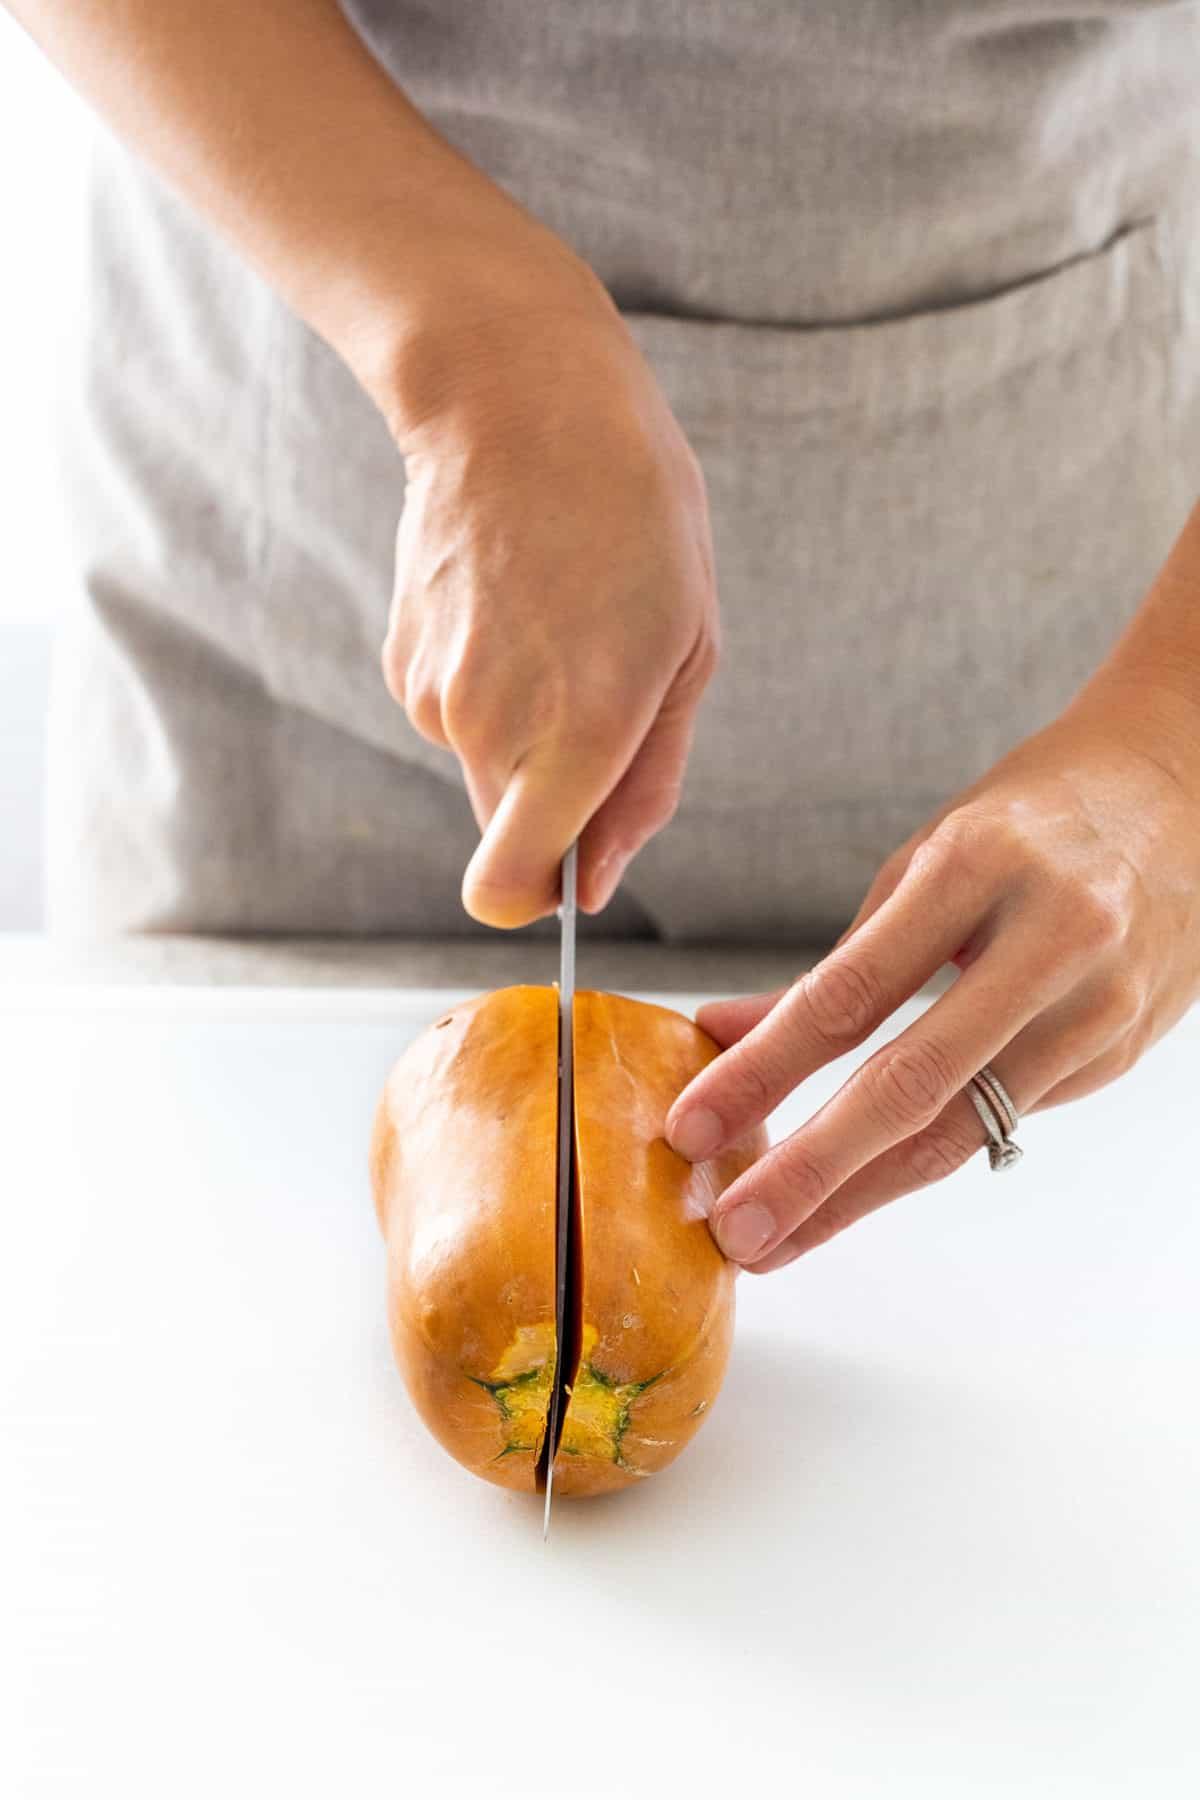 Slicing a honeynut squash length-wise